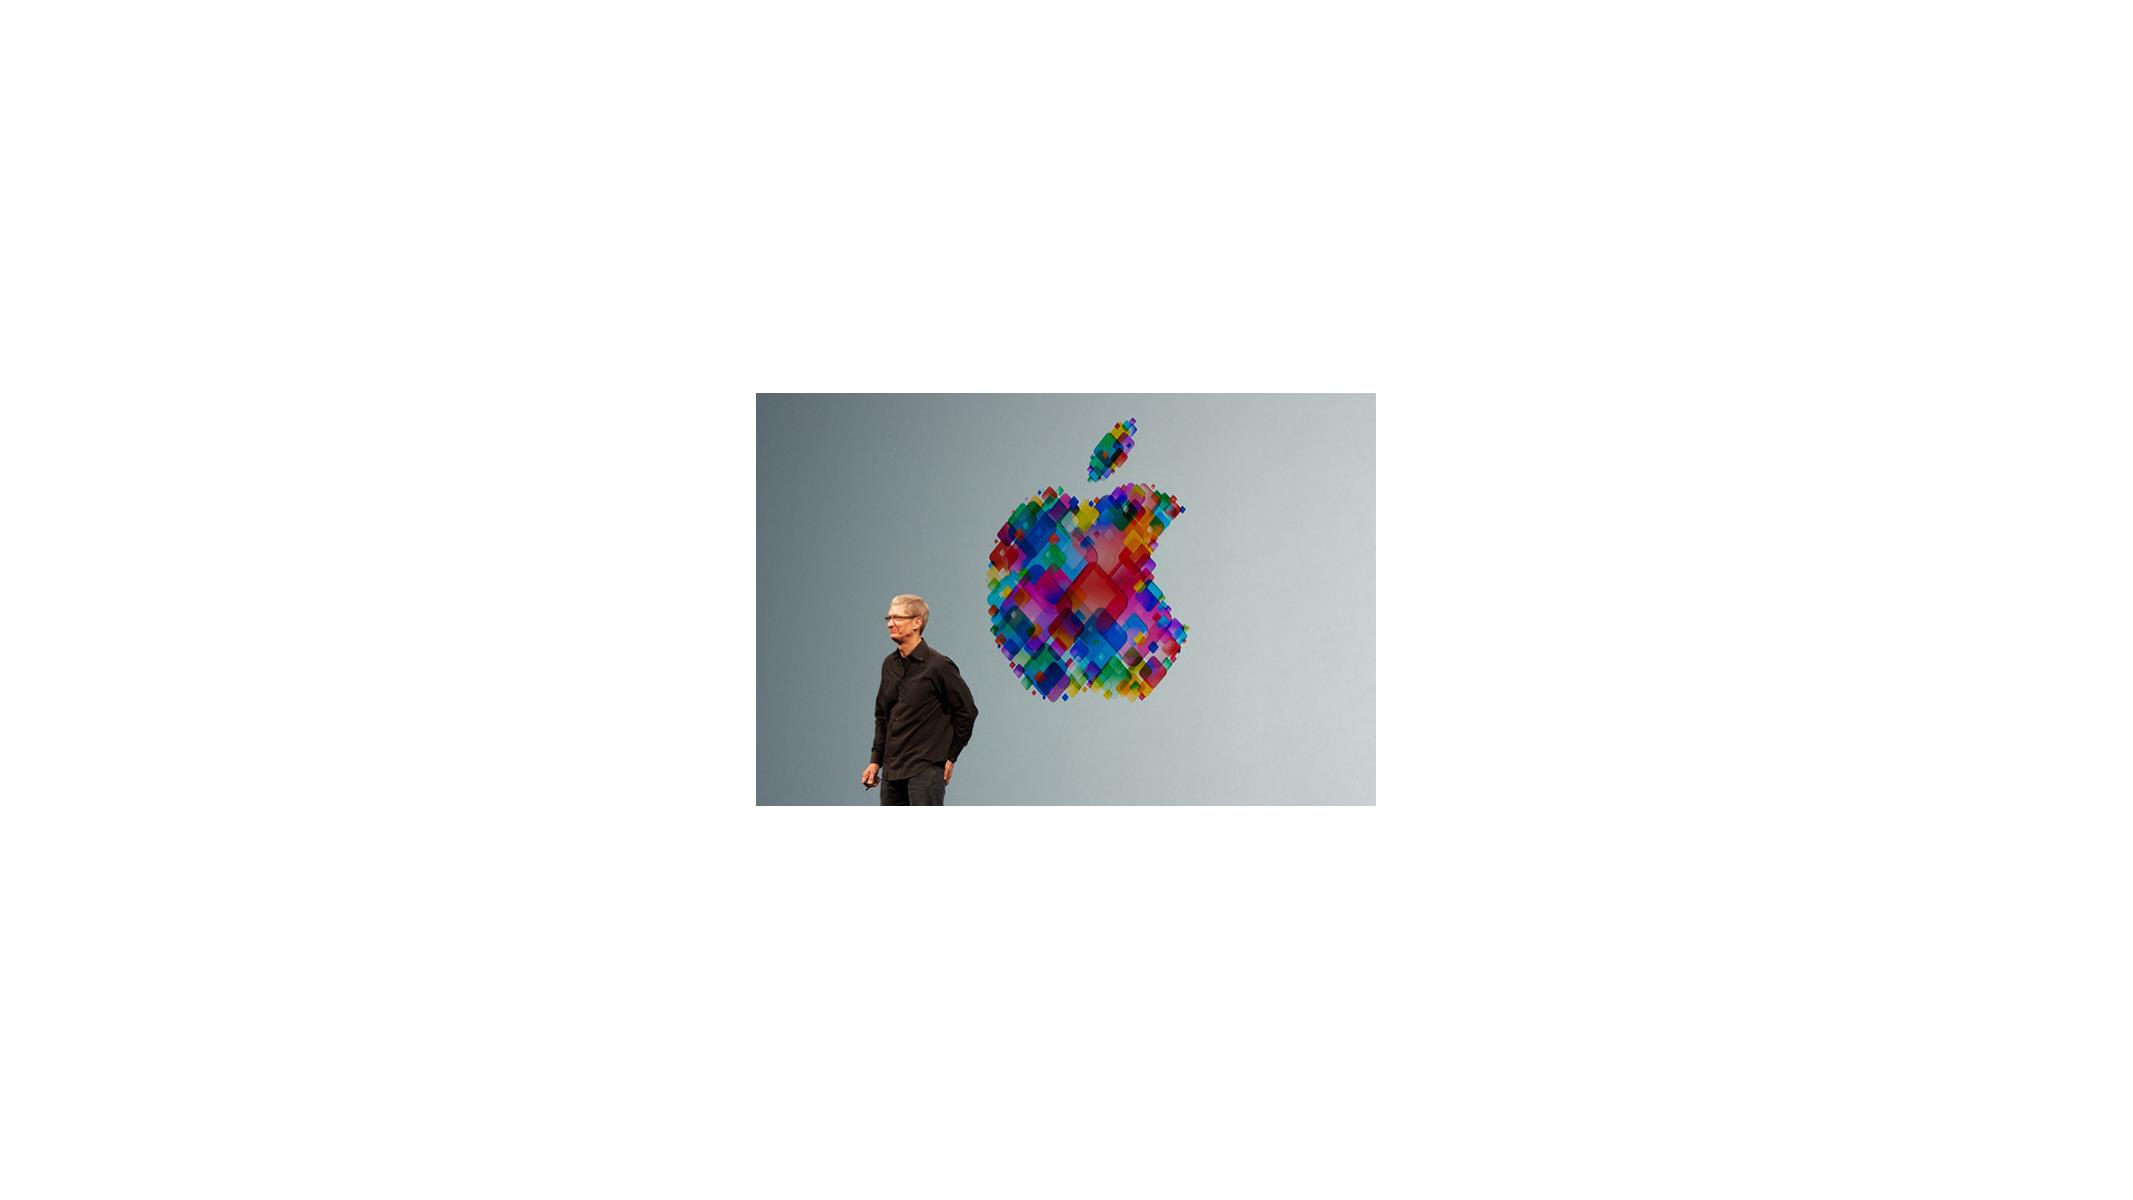 Qualcomm Accuses Apple Of Deadbeat Status With $7 Billion In Unpaid Chip Royalties